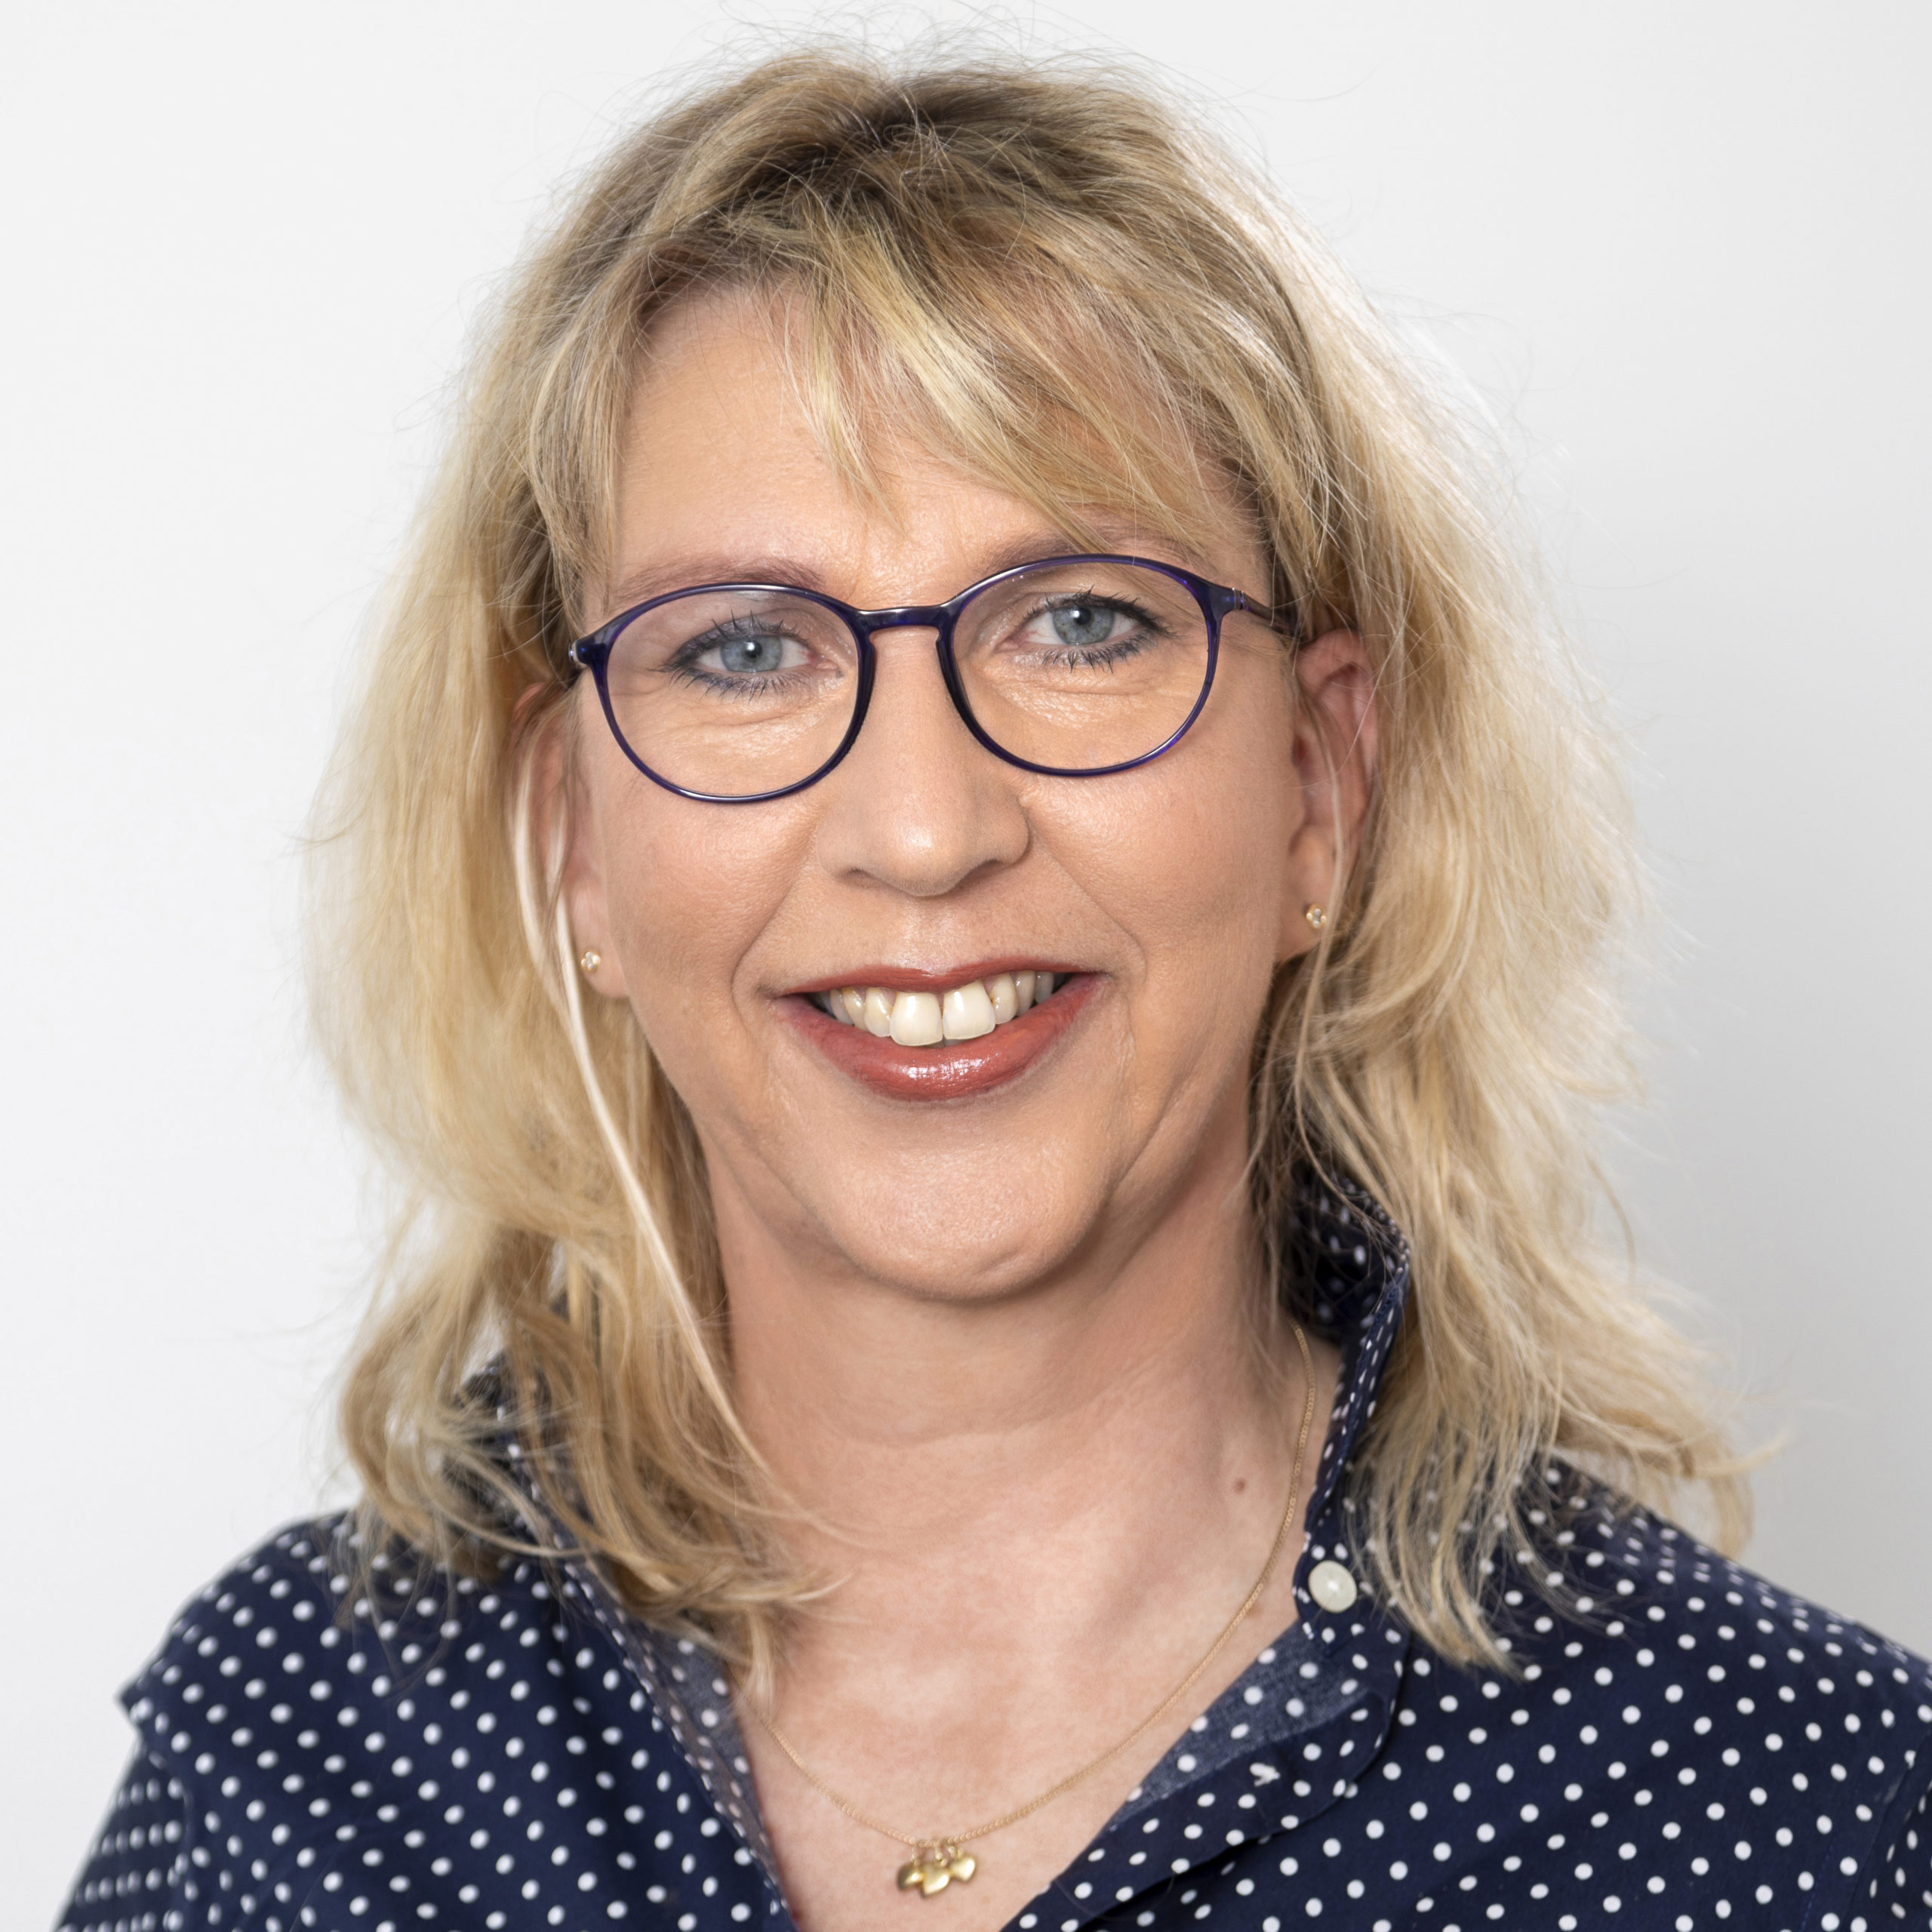 Iris Hoes Prodeba zorgprofessional